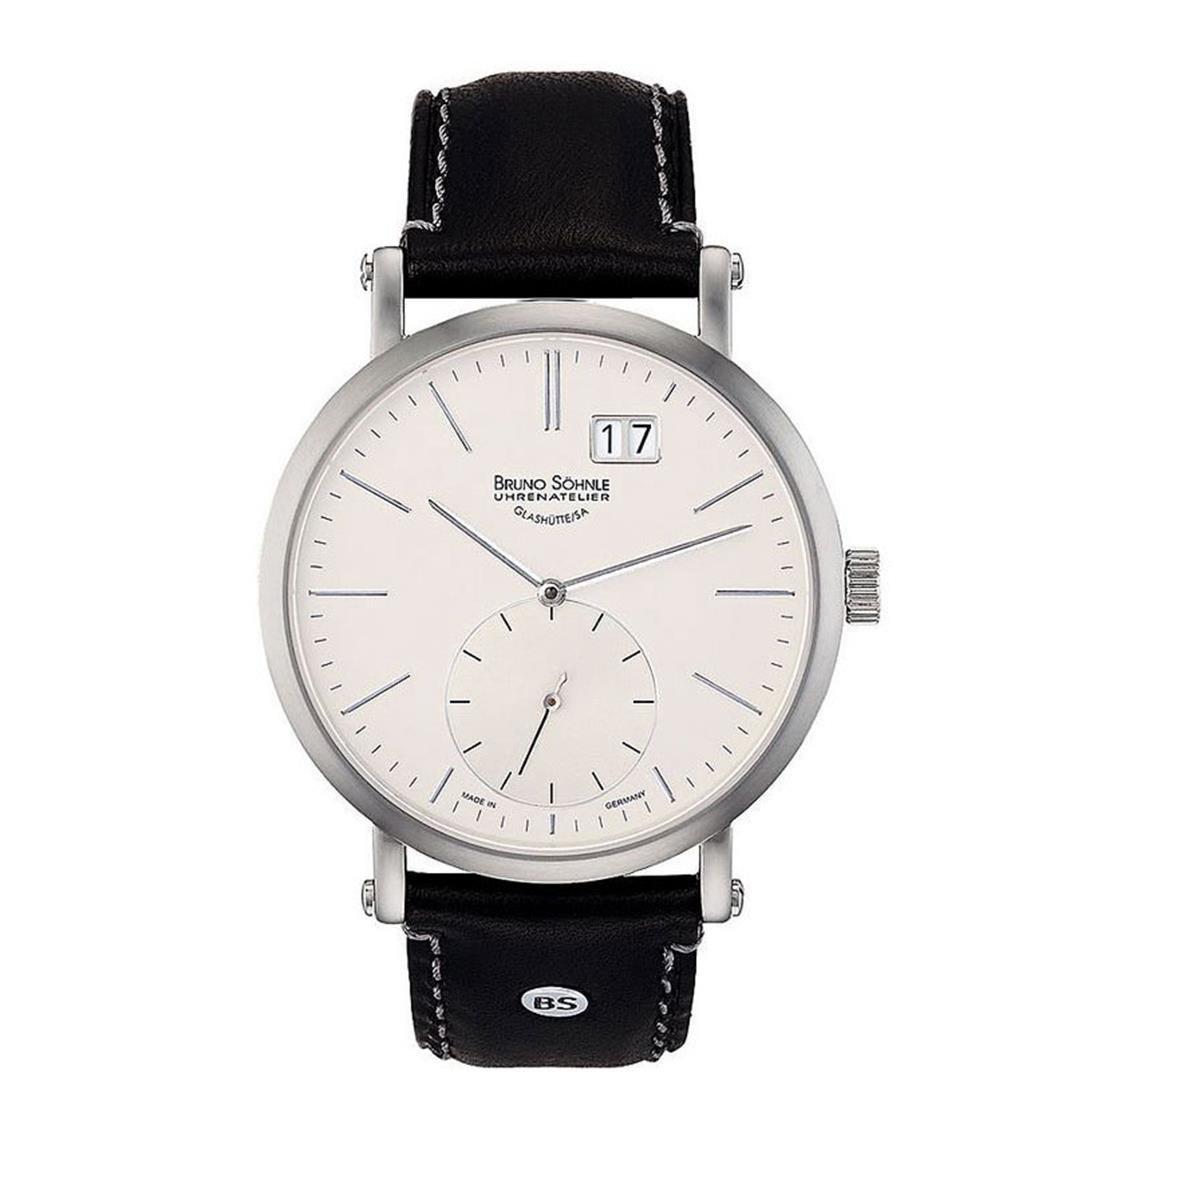 Herren Analog Quarz Uhr mit Leder Armband 17-13095-241